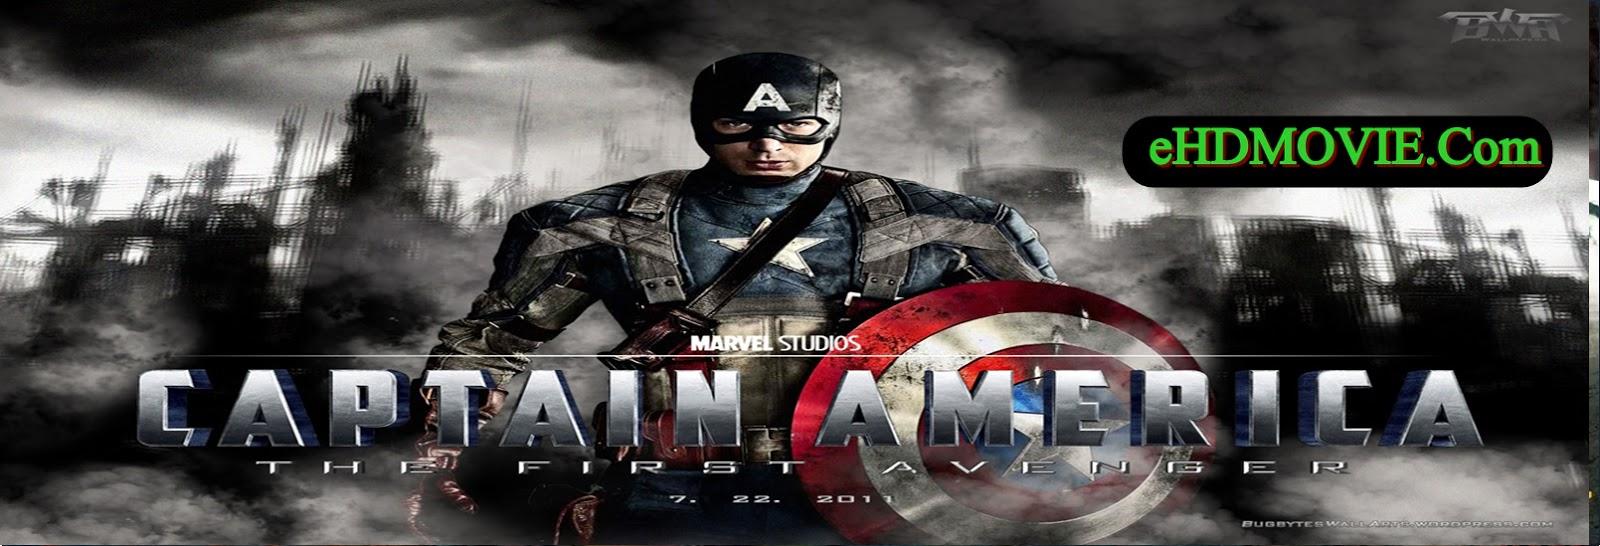 Captain America: The First Avenger 2011 Full Movie Dual Audio [Hindi – English] 1080p - 720p - 480p ORG BRRip 350MB - 1GB - 3.7GB ESubs Free Download